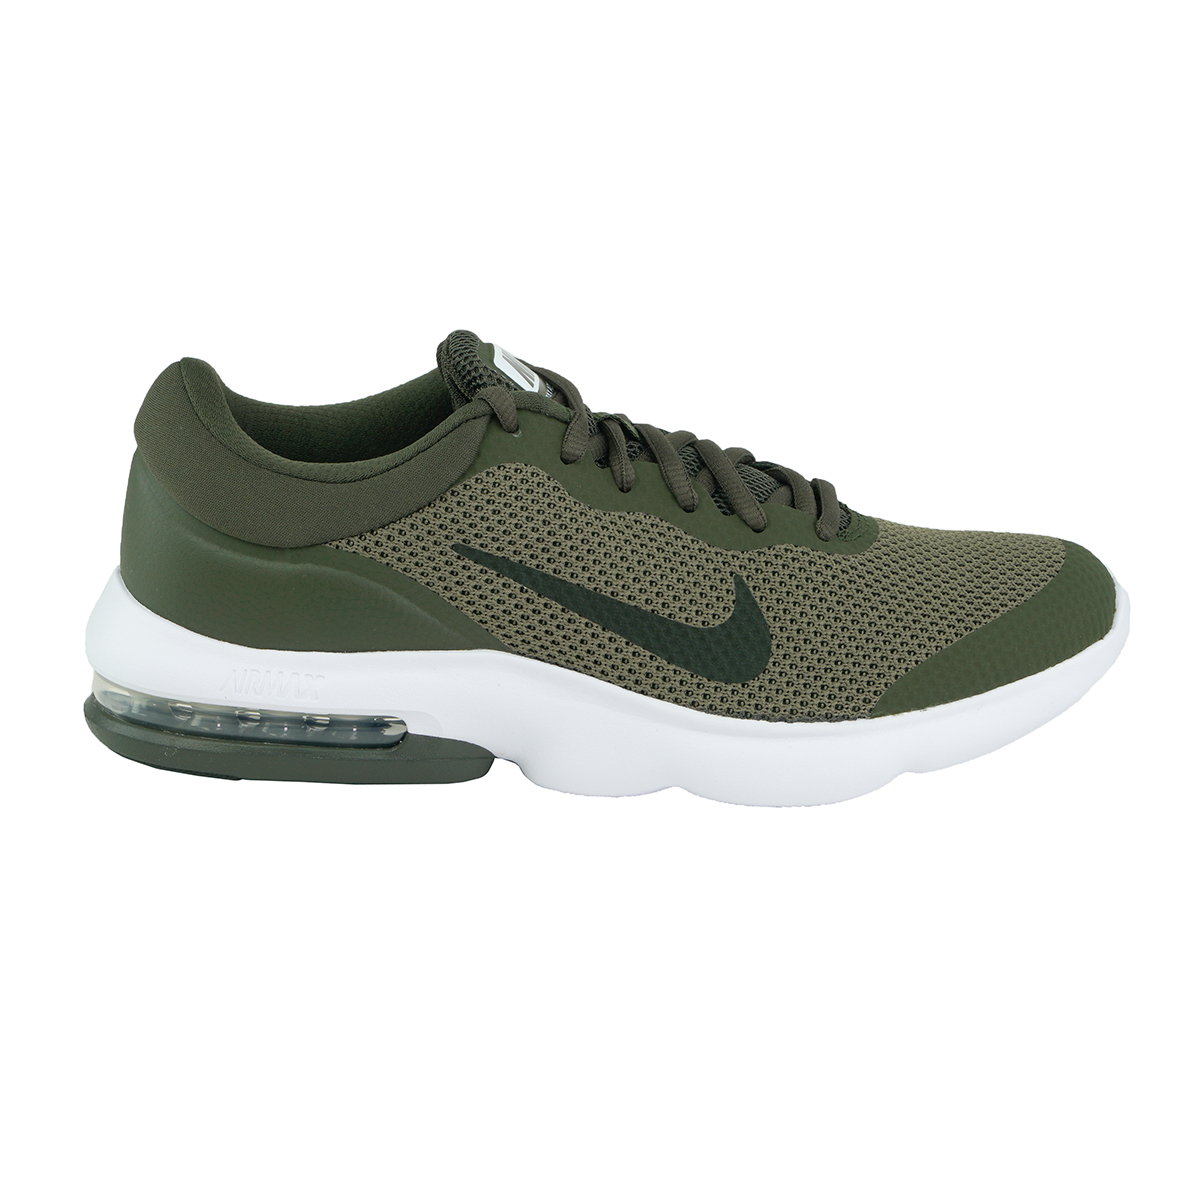 4ebb632f154 Nike Men s Air Max Advantage Shoes